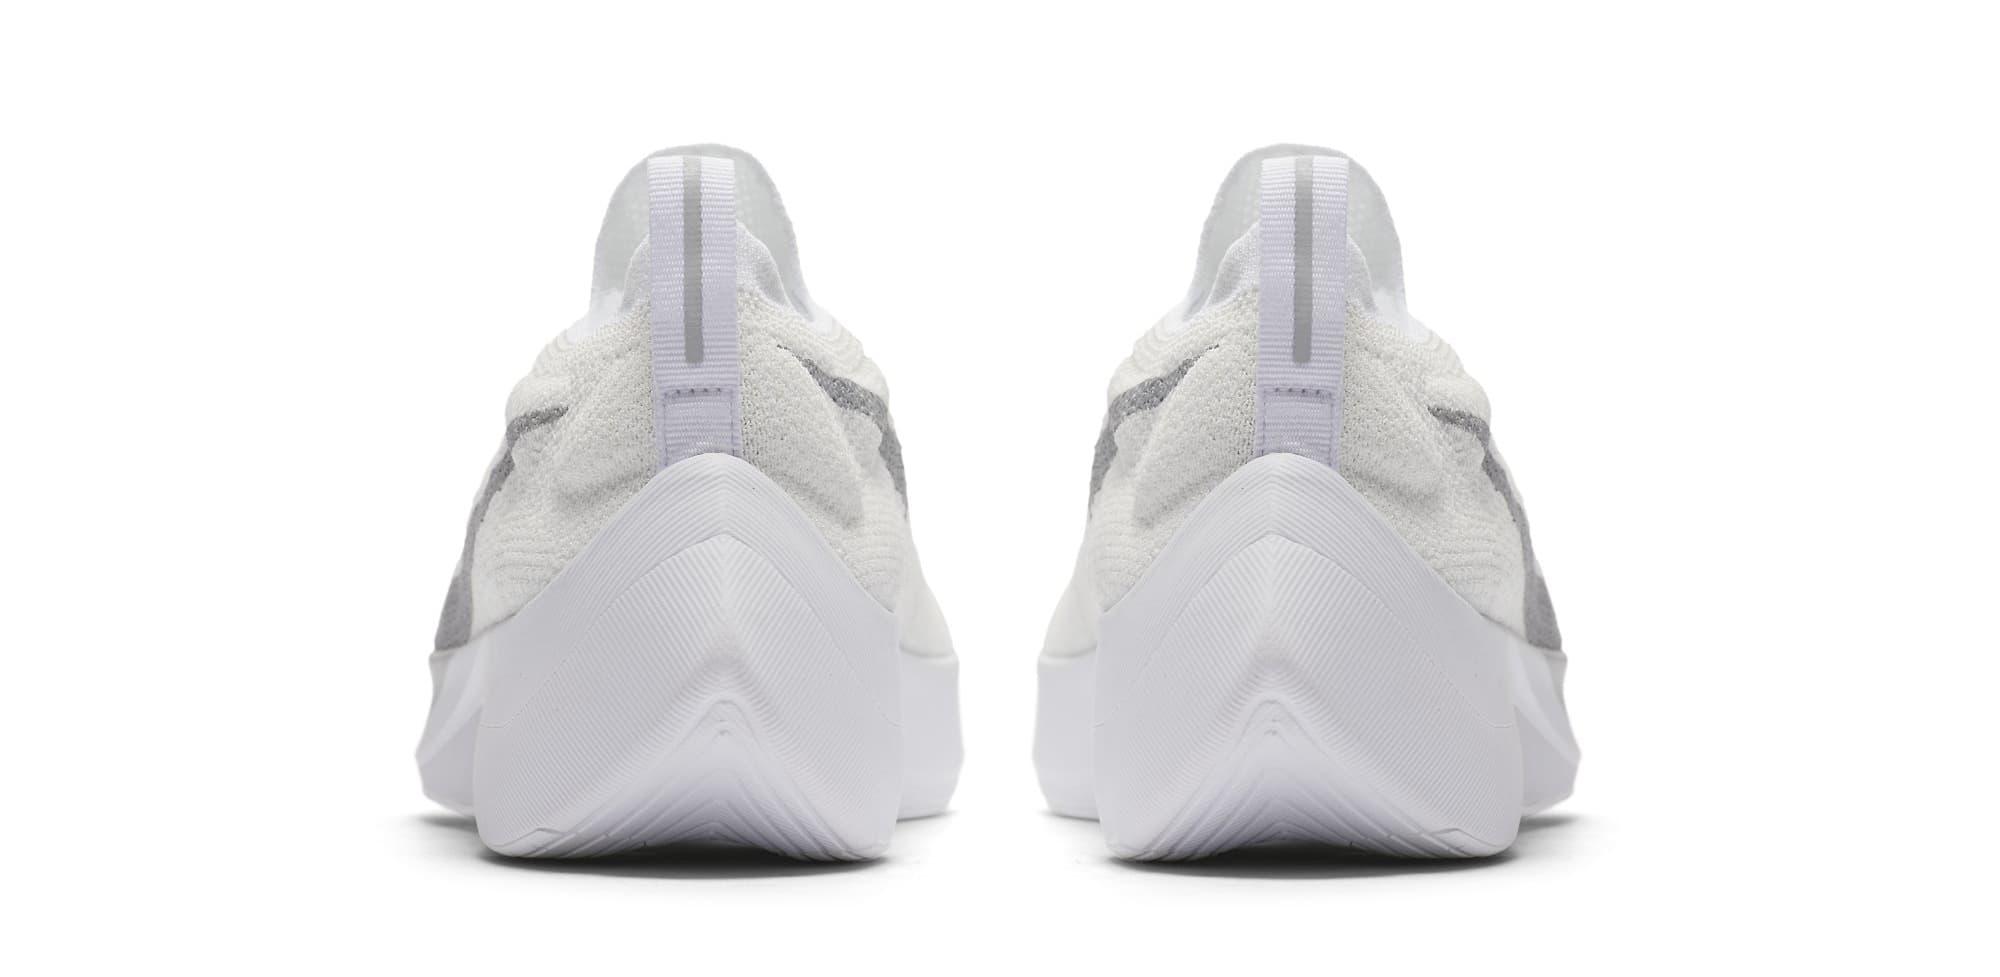 Nike Vapor Street Flyknit 'White/Wolf Grey' AQ1763-100 (Heel)